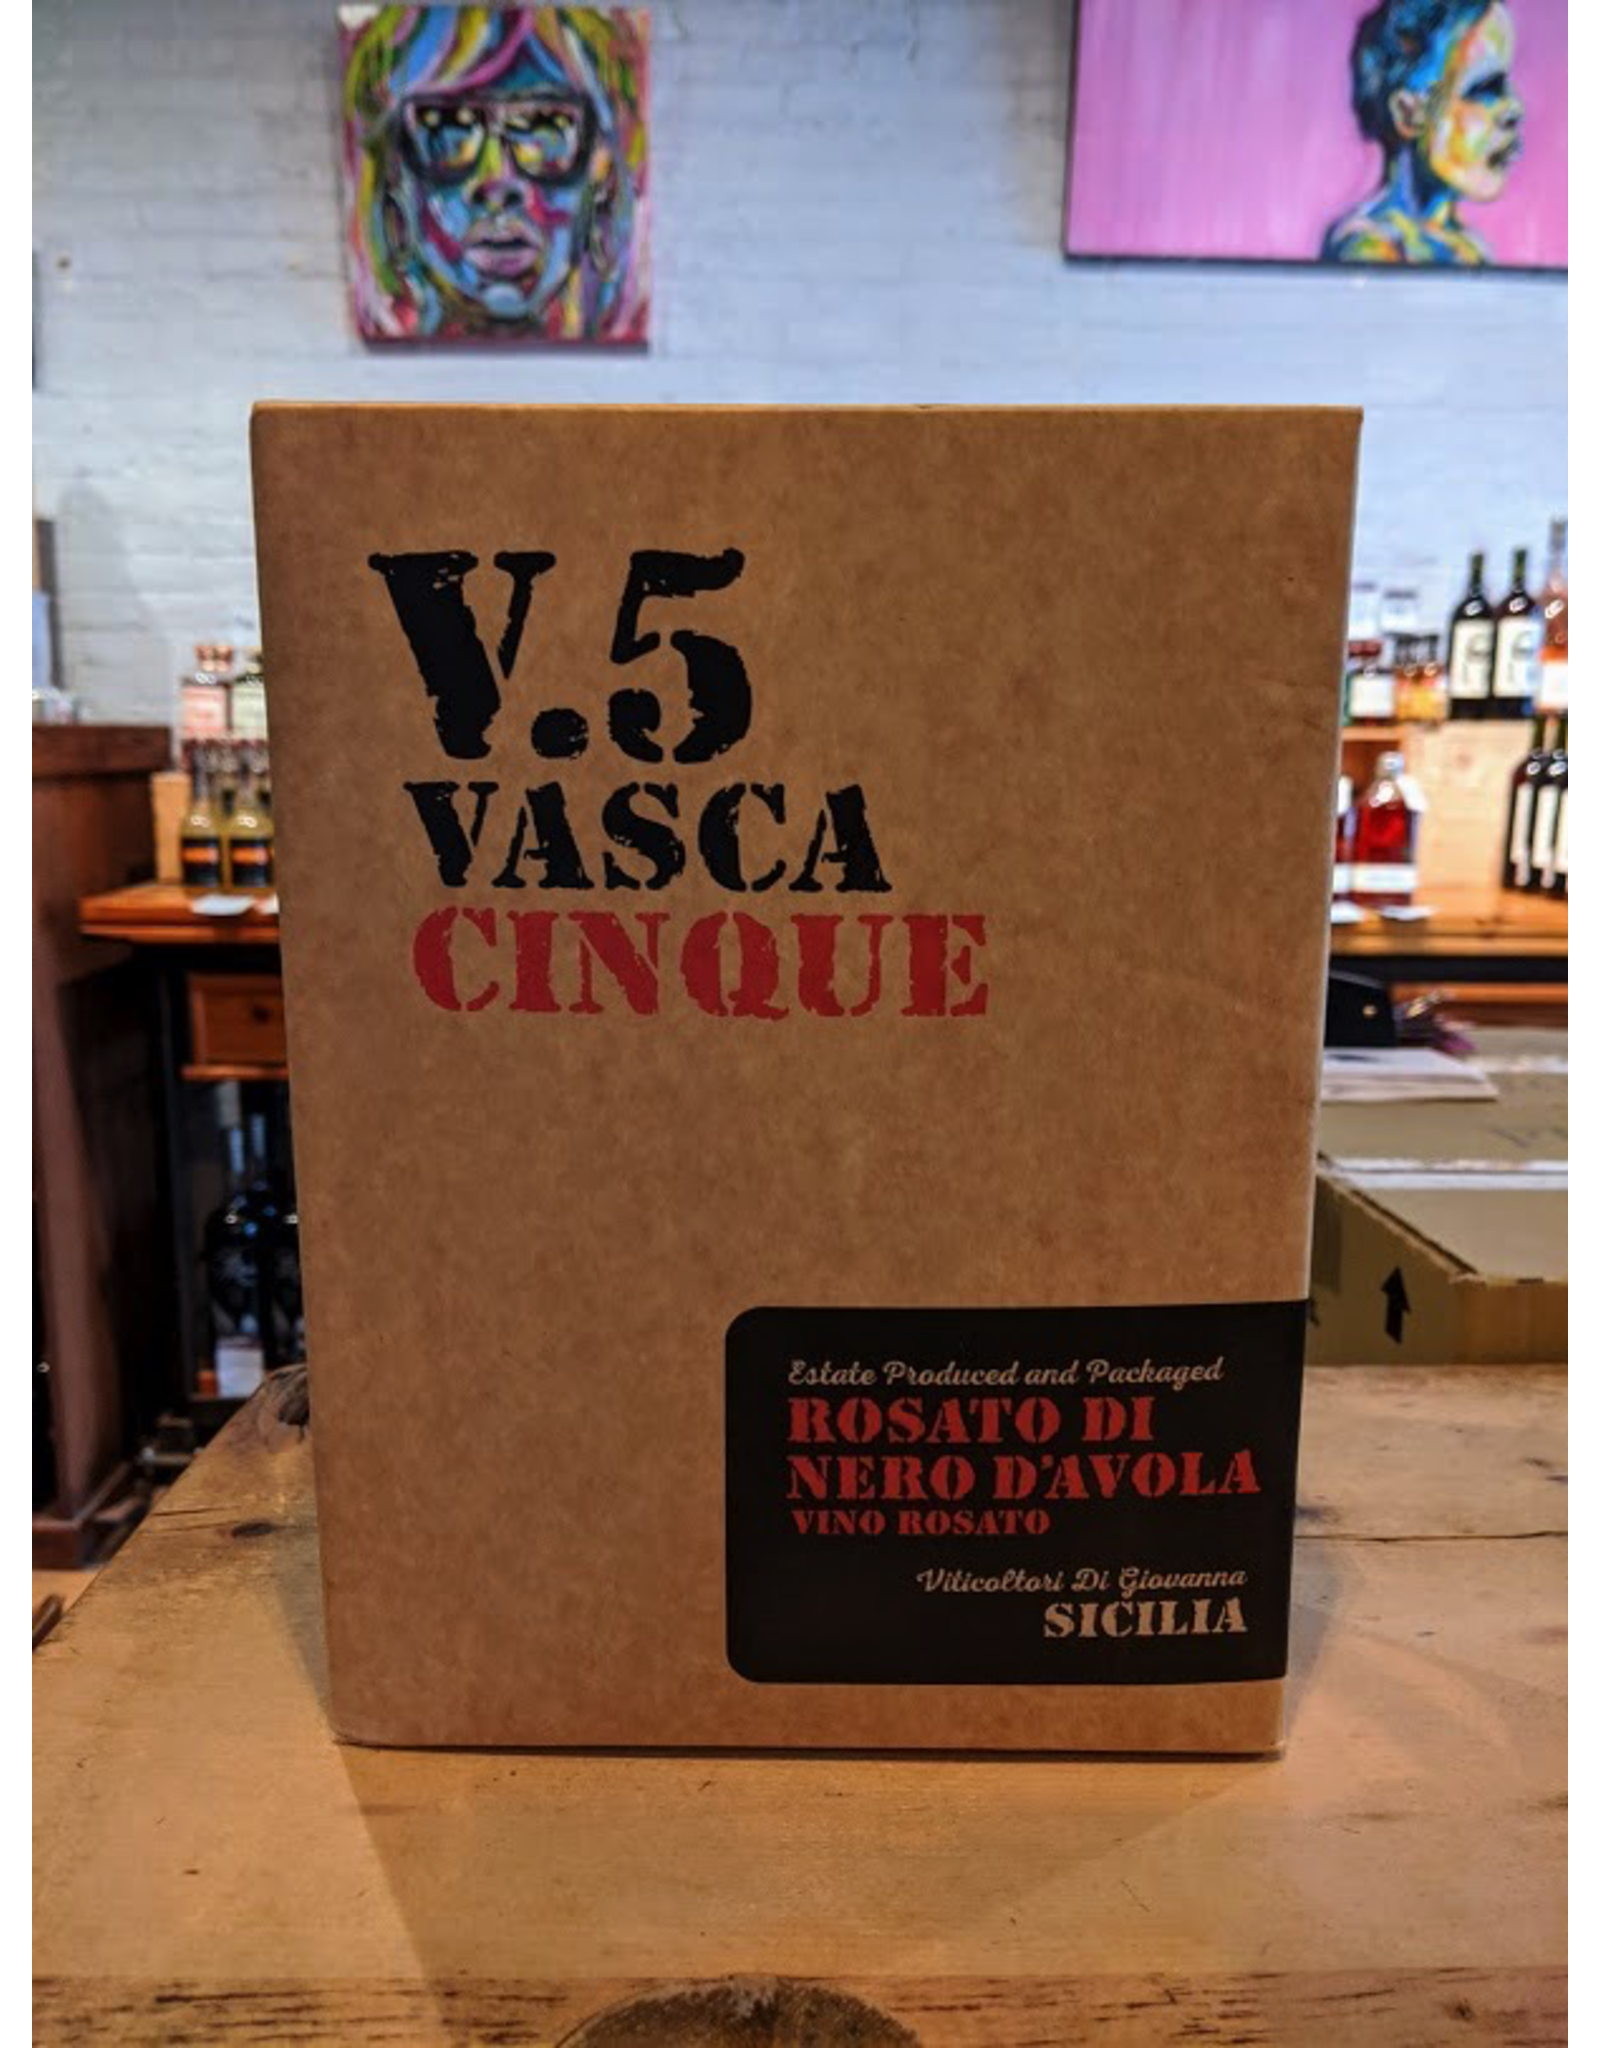 2019 Vasca Cinque V.5 Rosato di Nero d'Avola - Sicily, Italy (3Ltr Bag in Box)